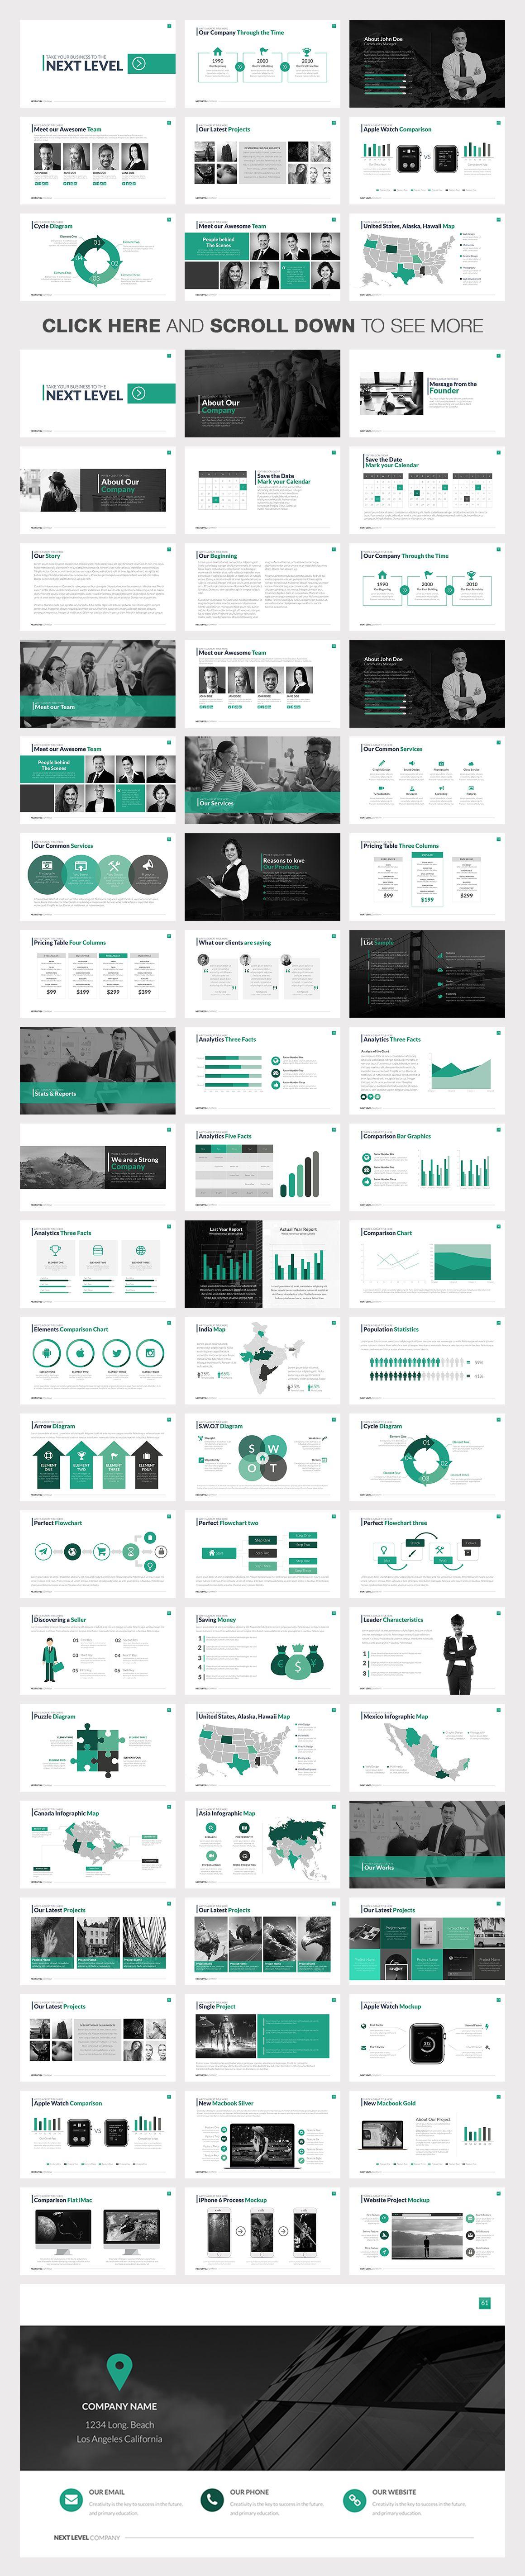 Next Level Powerpoint Template - Presentations - 2 | Design ...